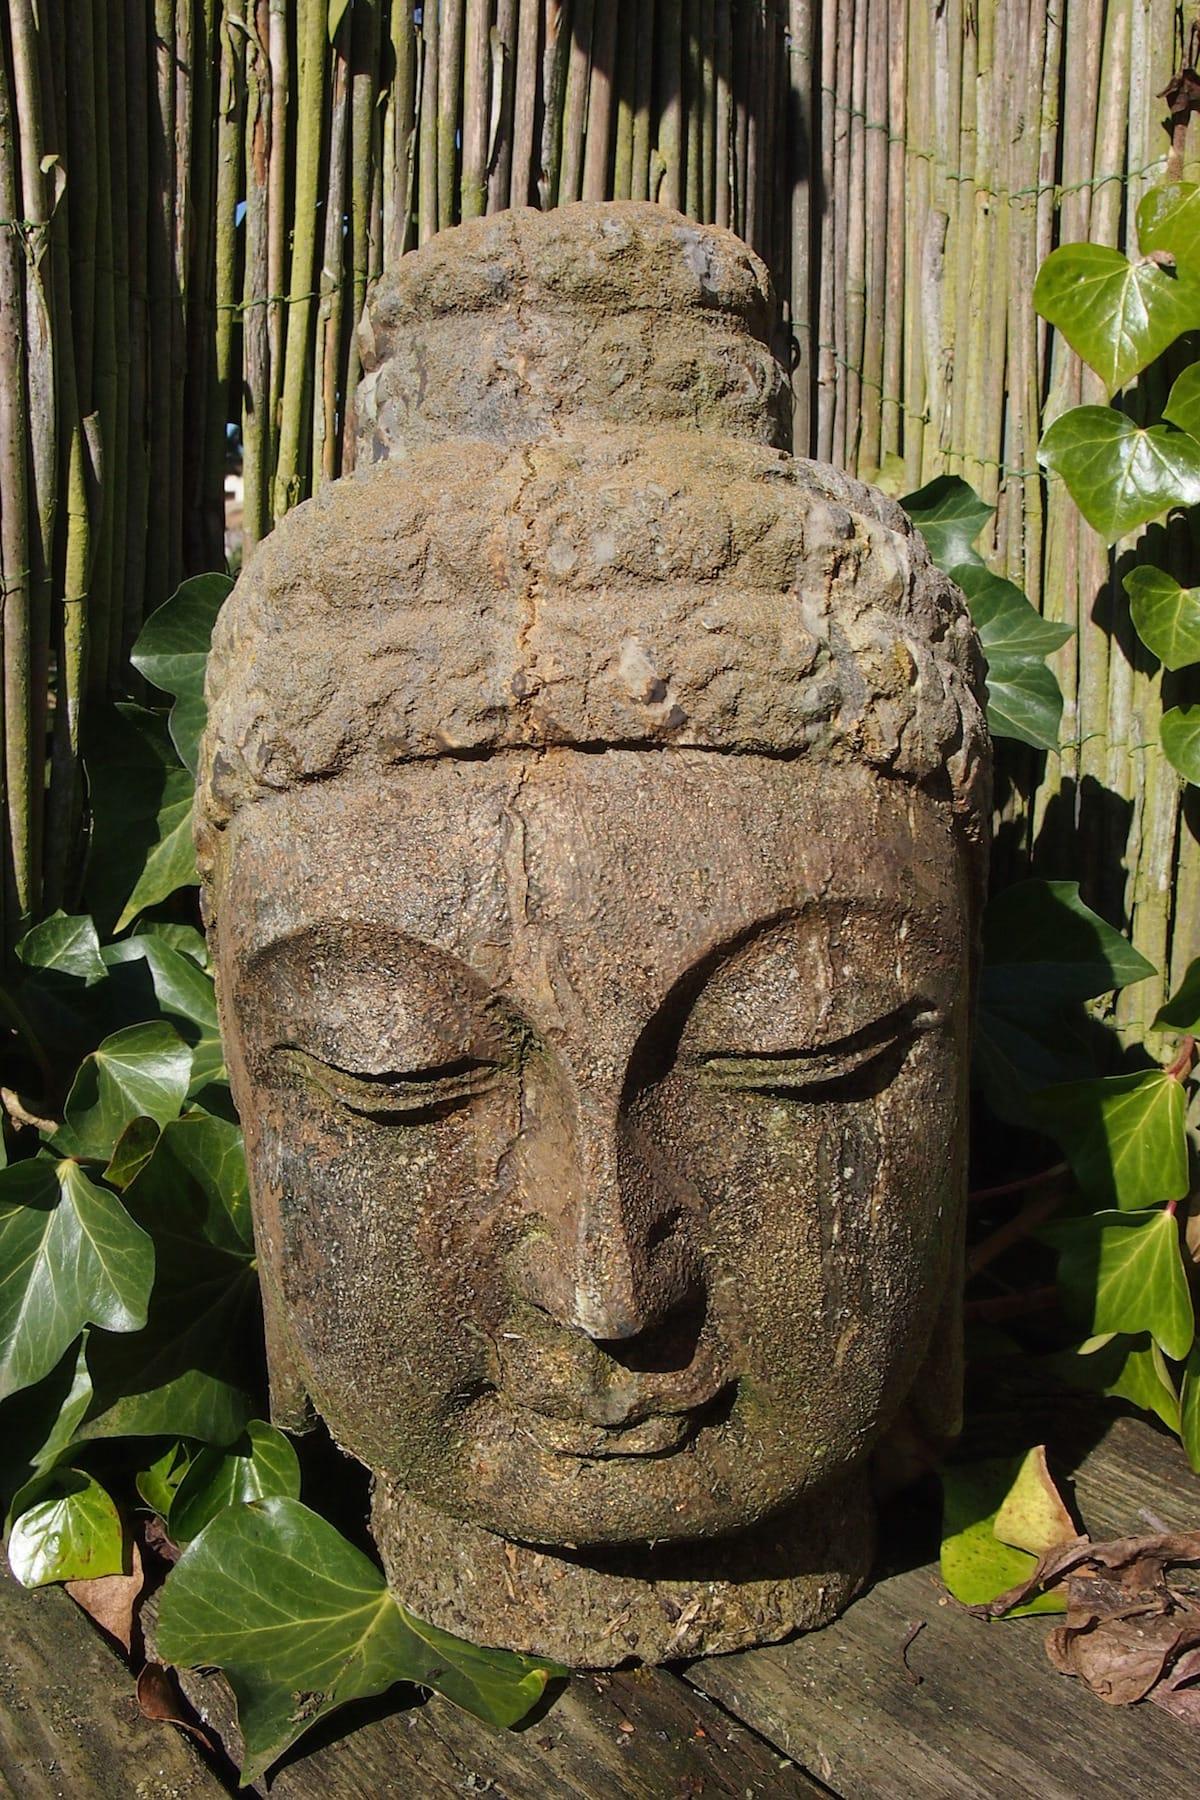 Shambhala Sun, Cheerfulness, Happiness, Sakyong Mipham, Vajrayana / Tibetan Buddhism, Lion's Roar, Buddhism